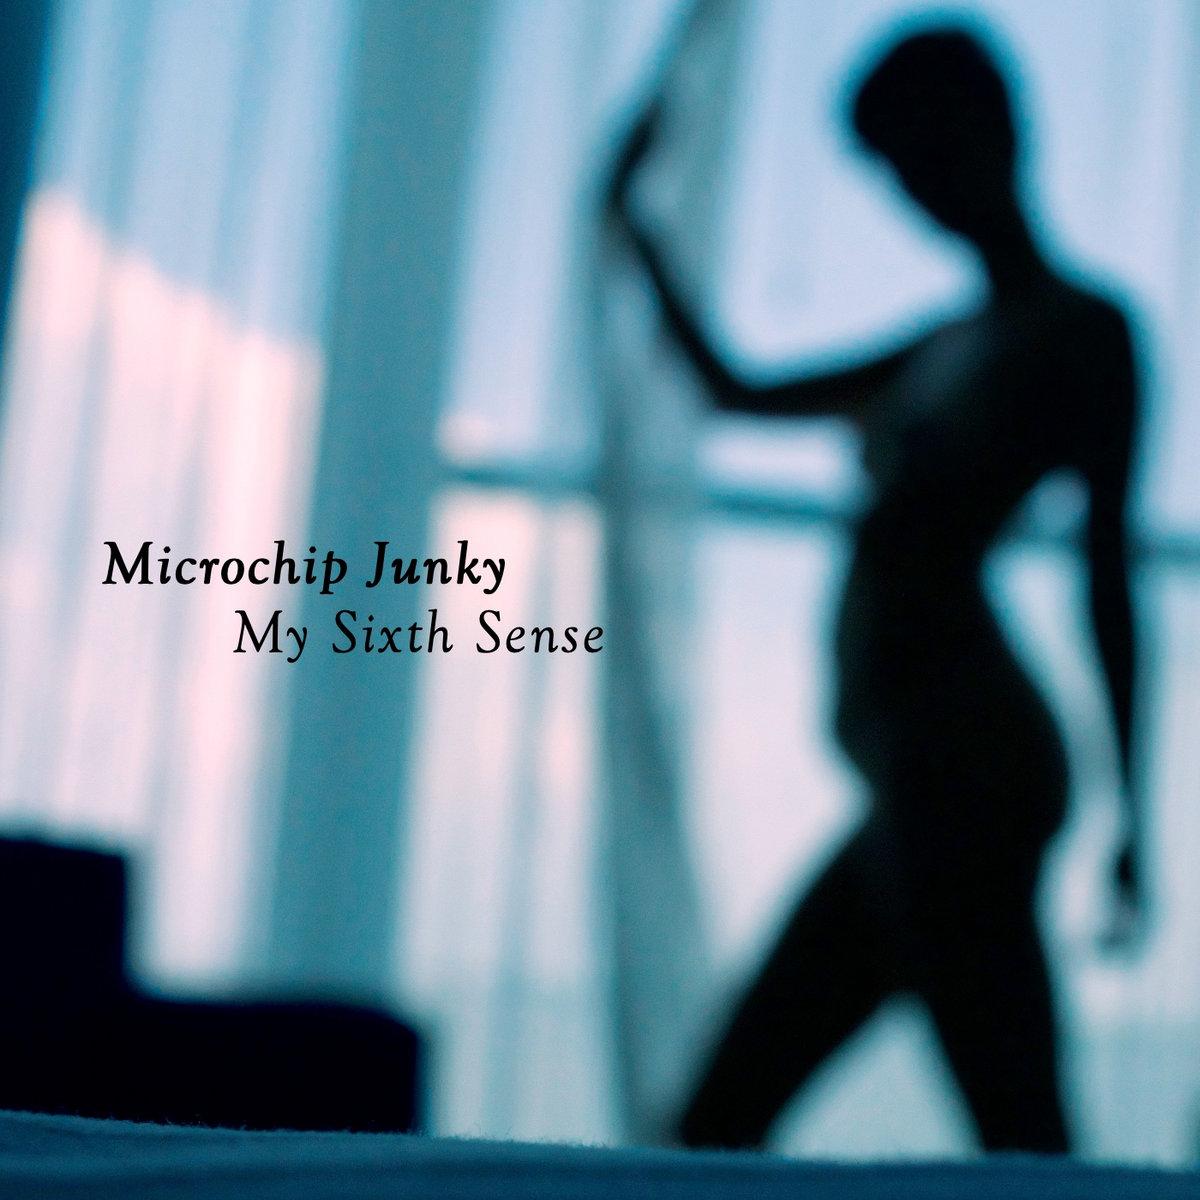 My Sixth Sense (Alternative Instrumental) | microchip junky